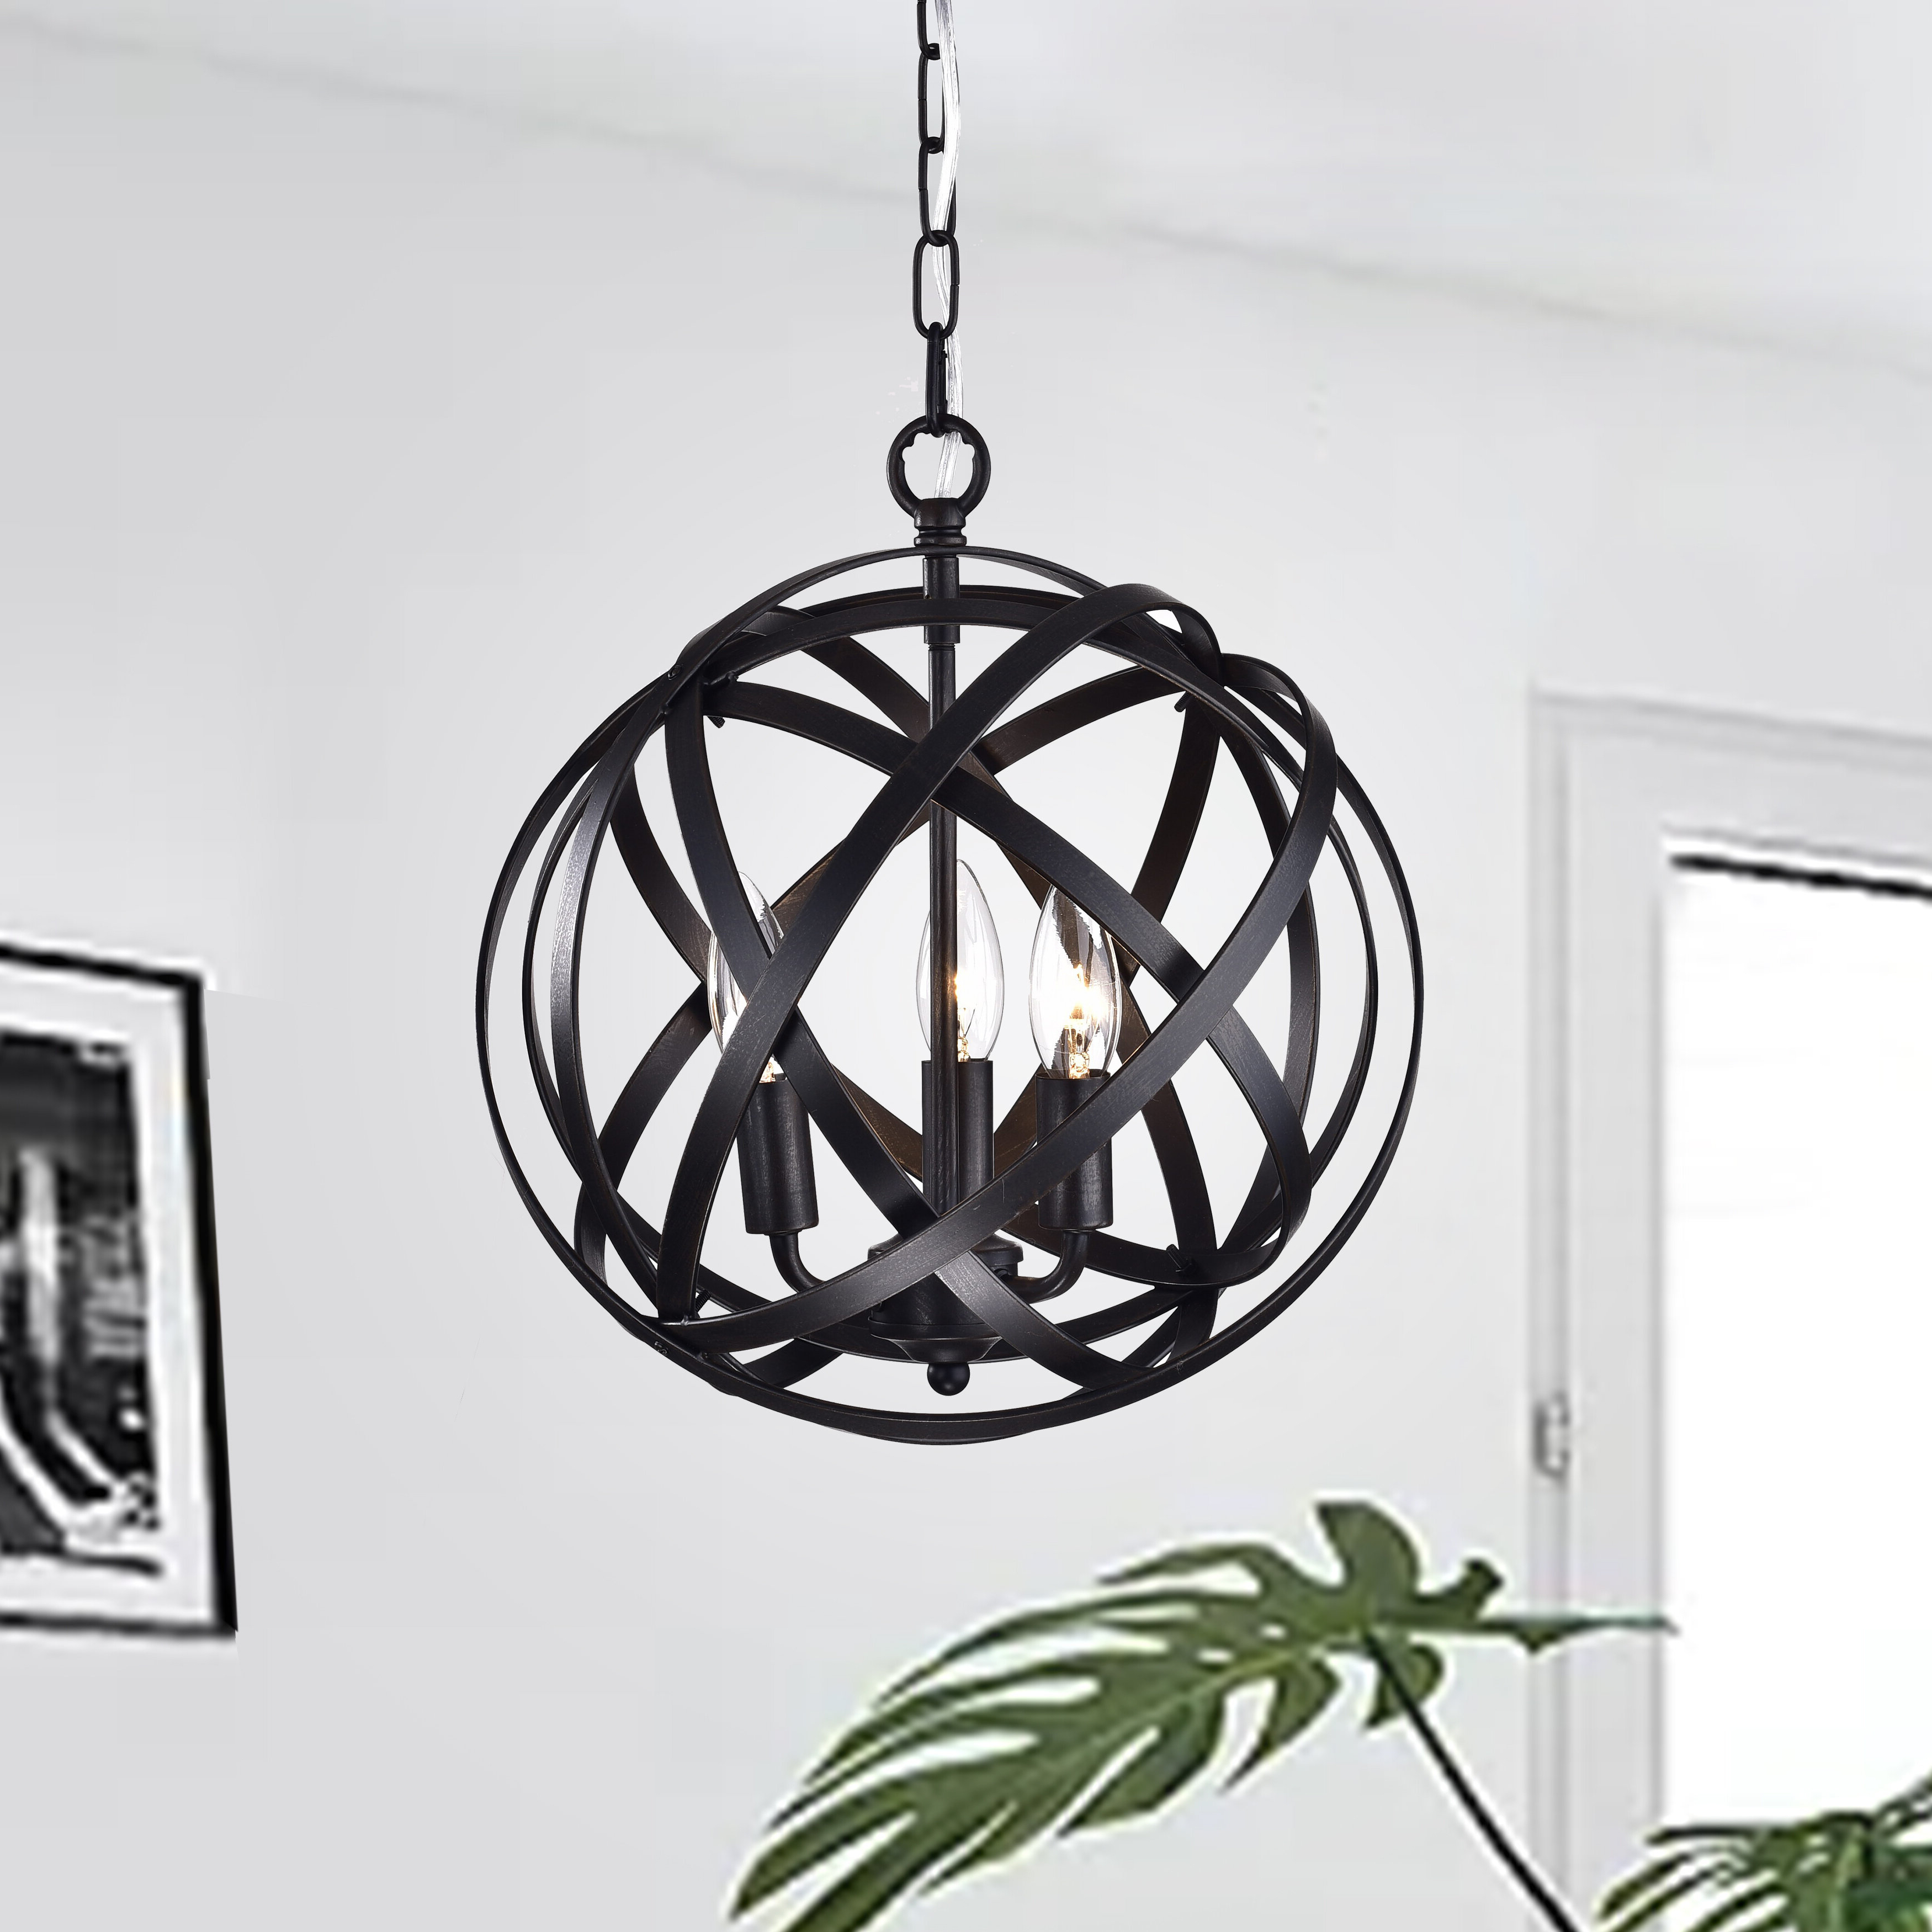 Joss & Main Throughout Popular Alden 3 Light Single Globe Pendants (Gallery 19 of 20)